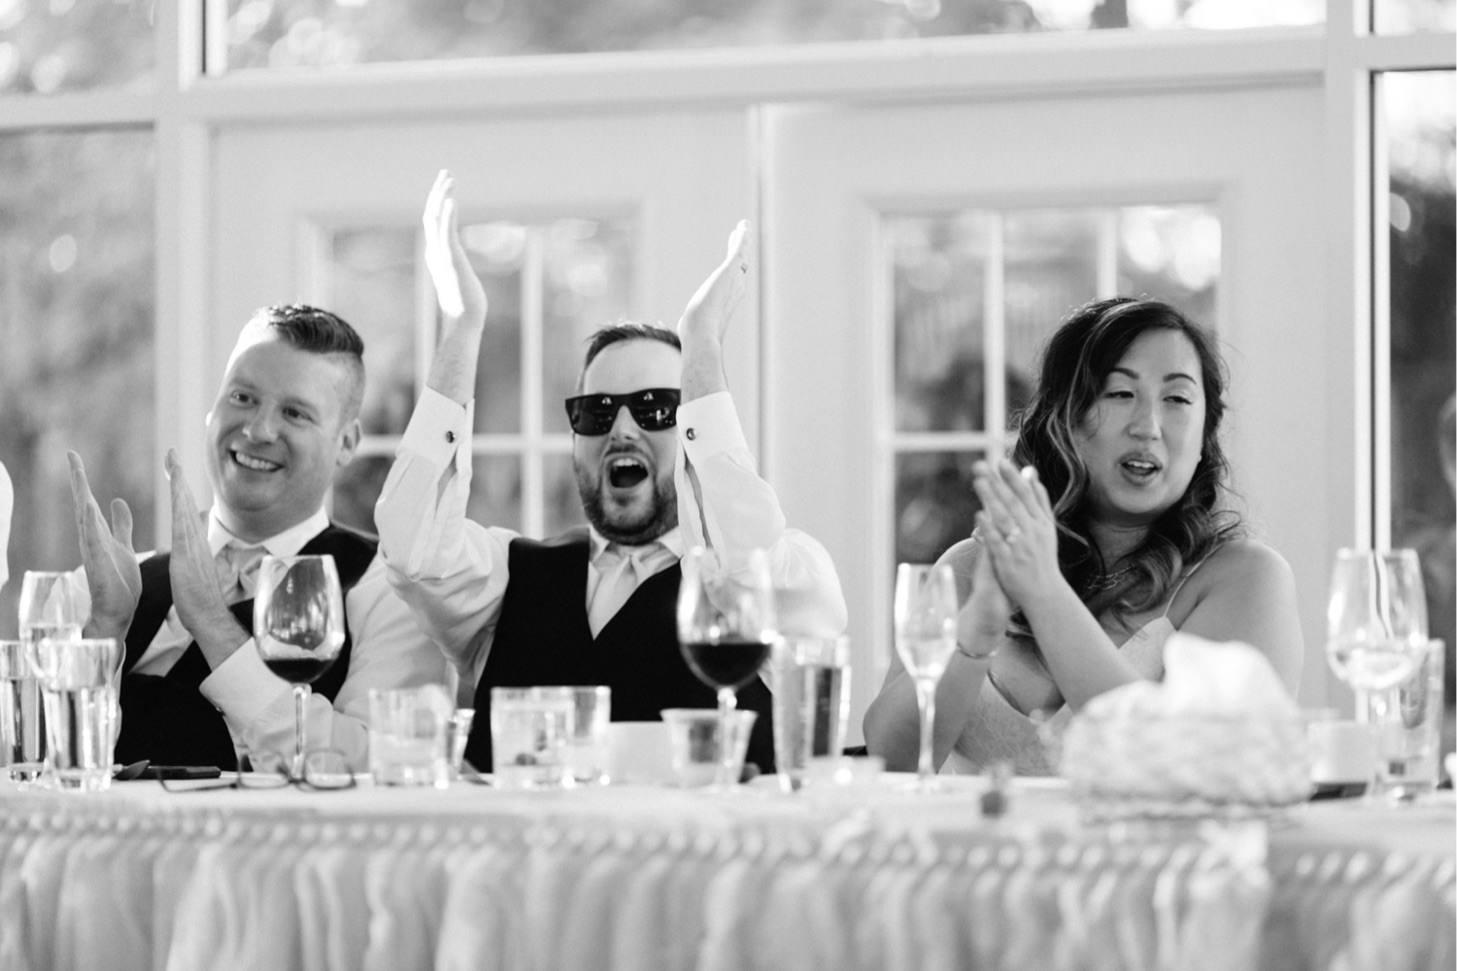 ritz-charles-wedding-reception-downtown-indianapolis-wedding-photographer045.JPG